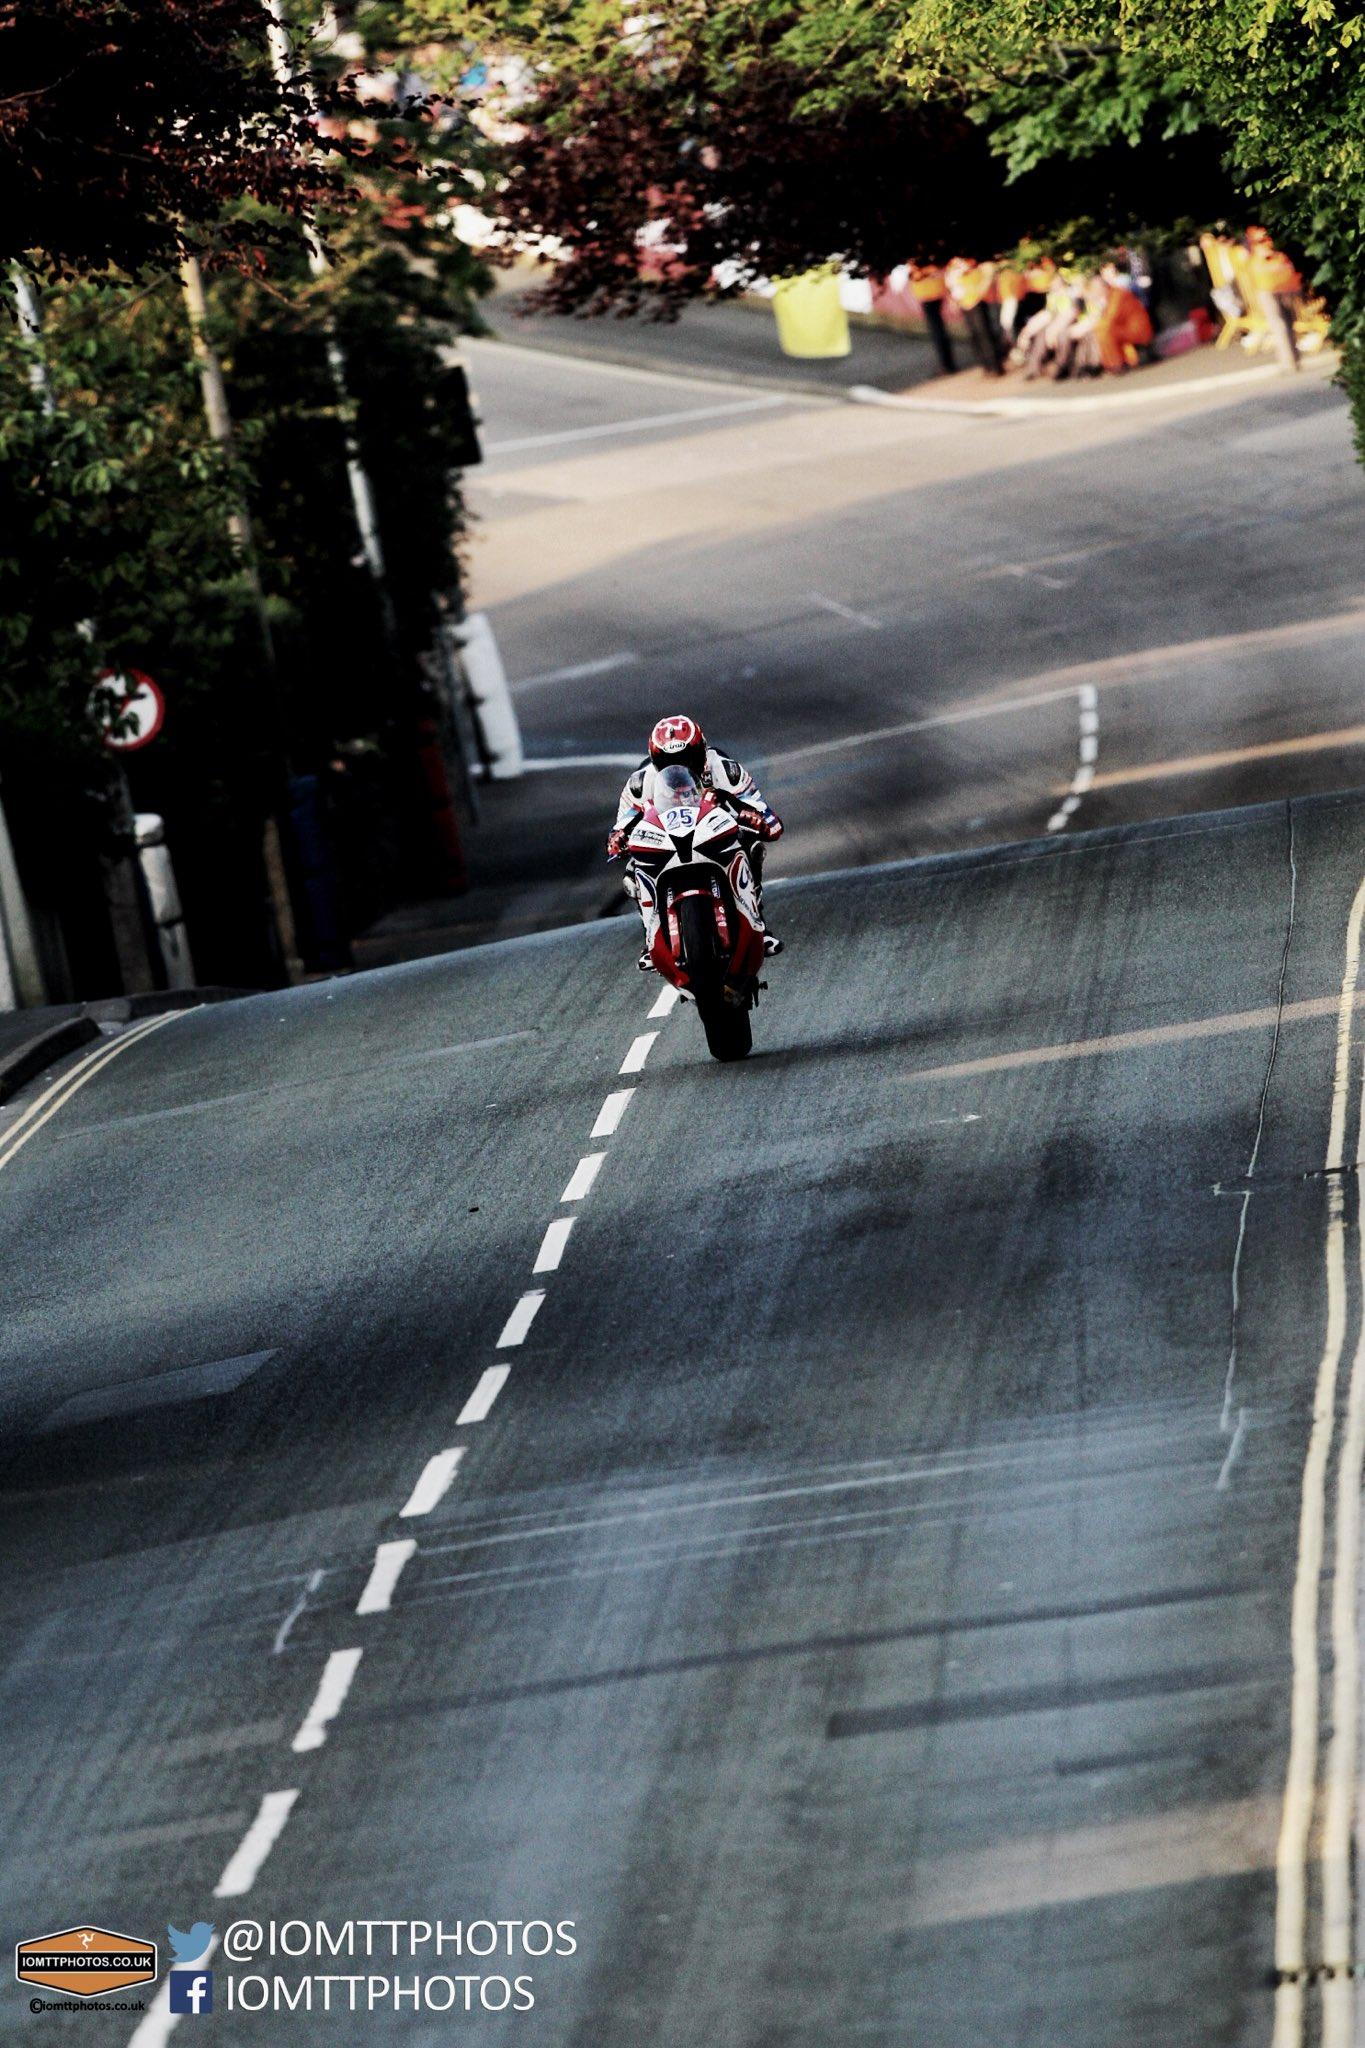 [Road Racing] TT 2016 - Page 4 Cjn3H1wWgAEwYQR